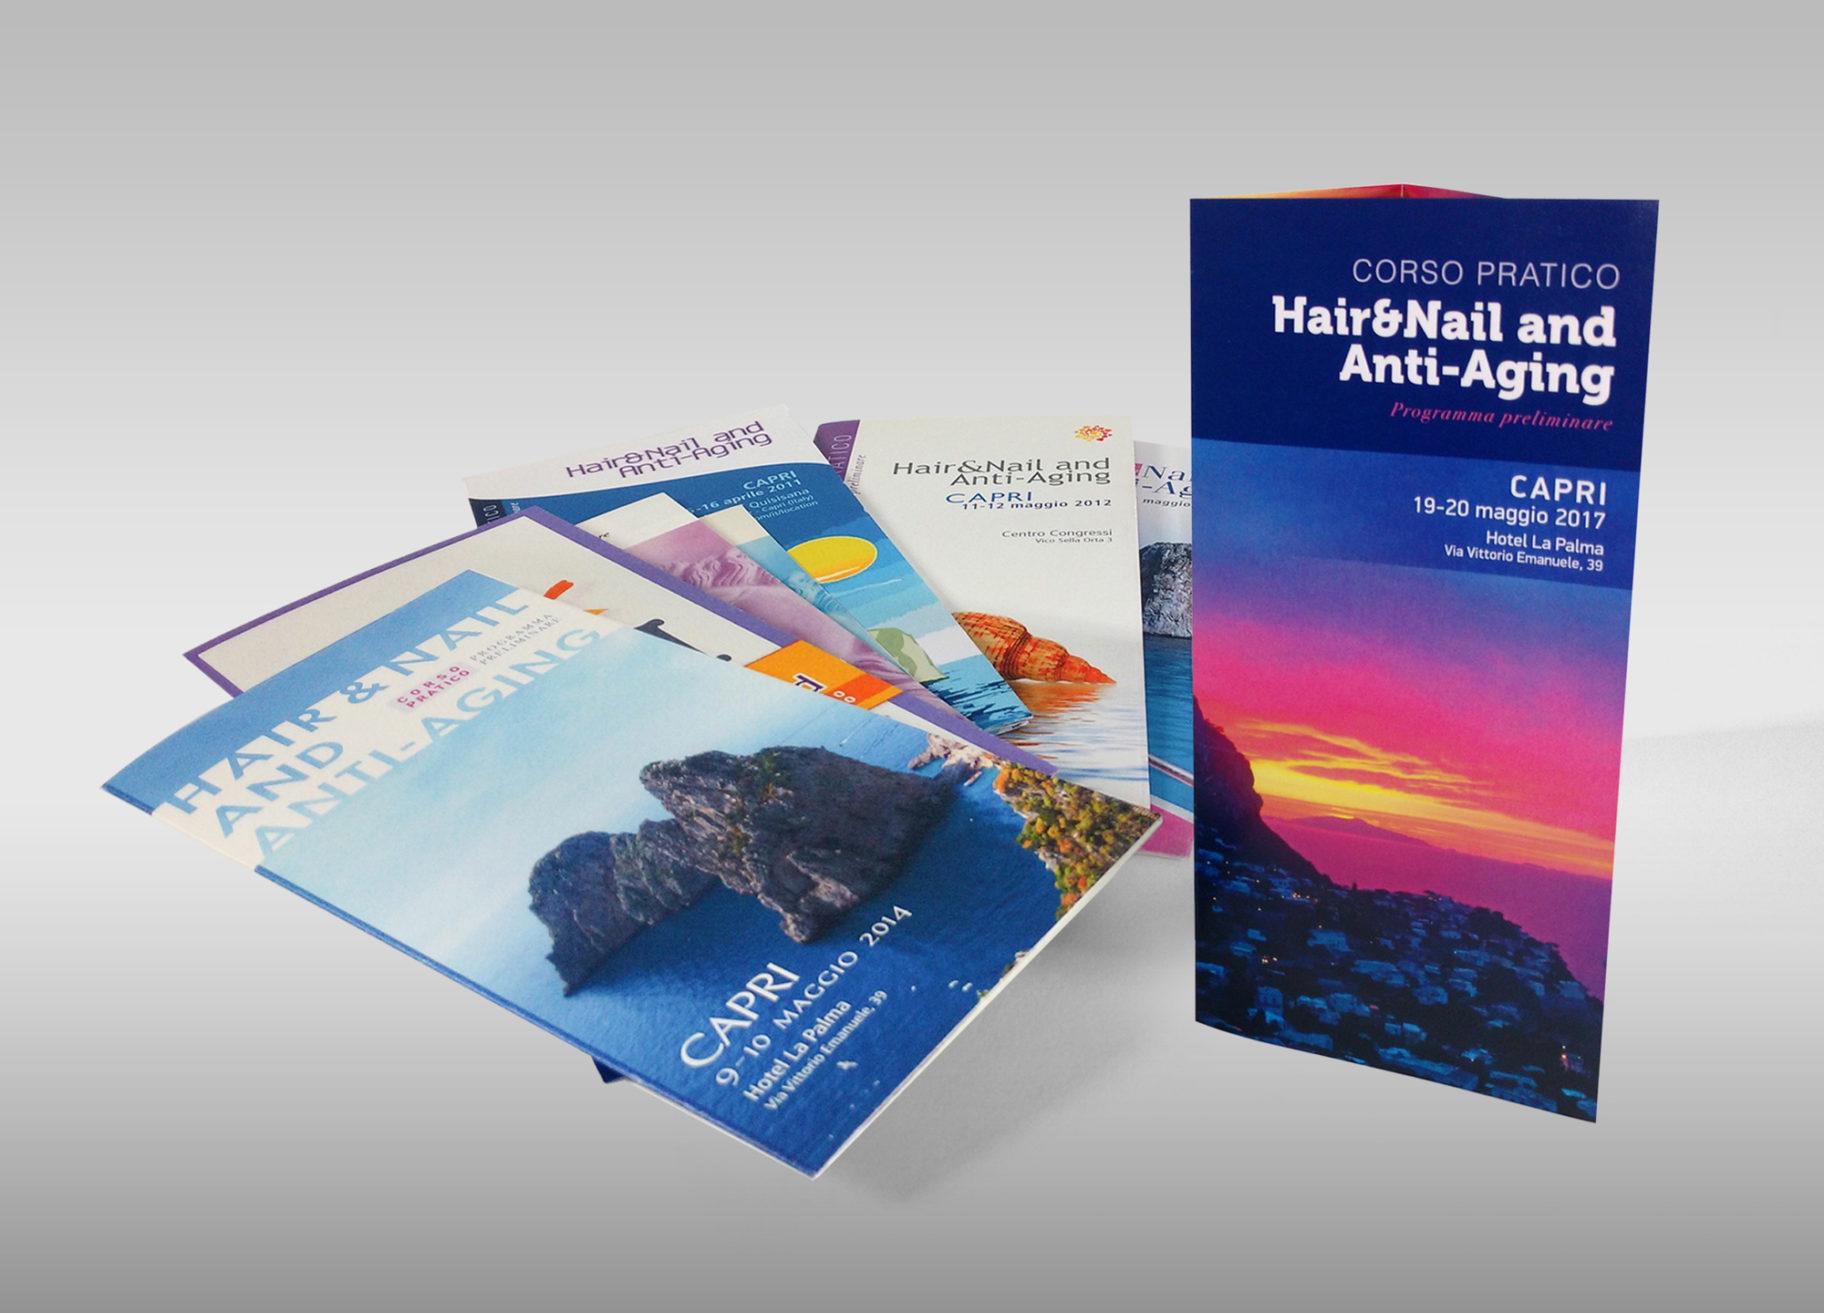 Hair&Nail and Anti-Aging-Capri-Pieghevoli